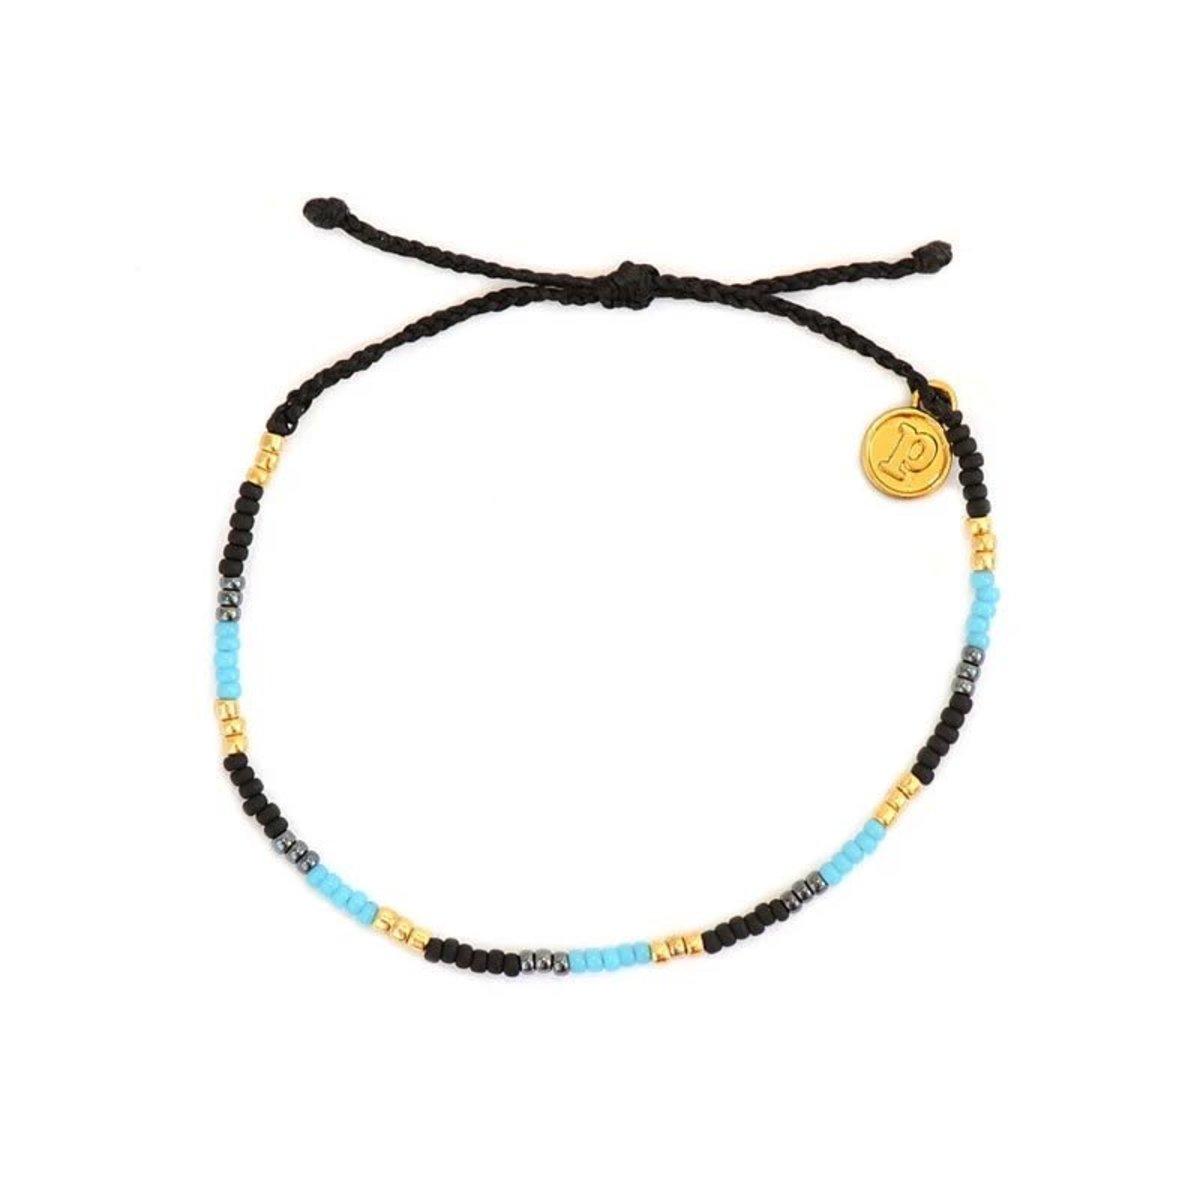 Stella Seed Bead Bracelet